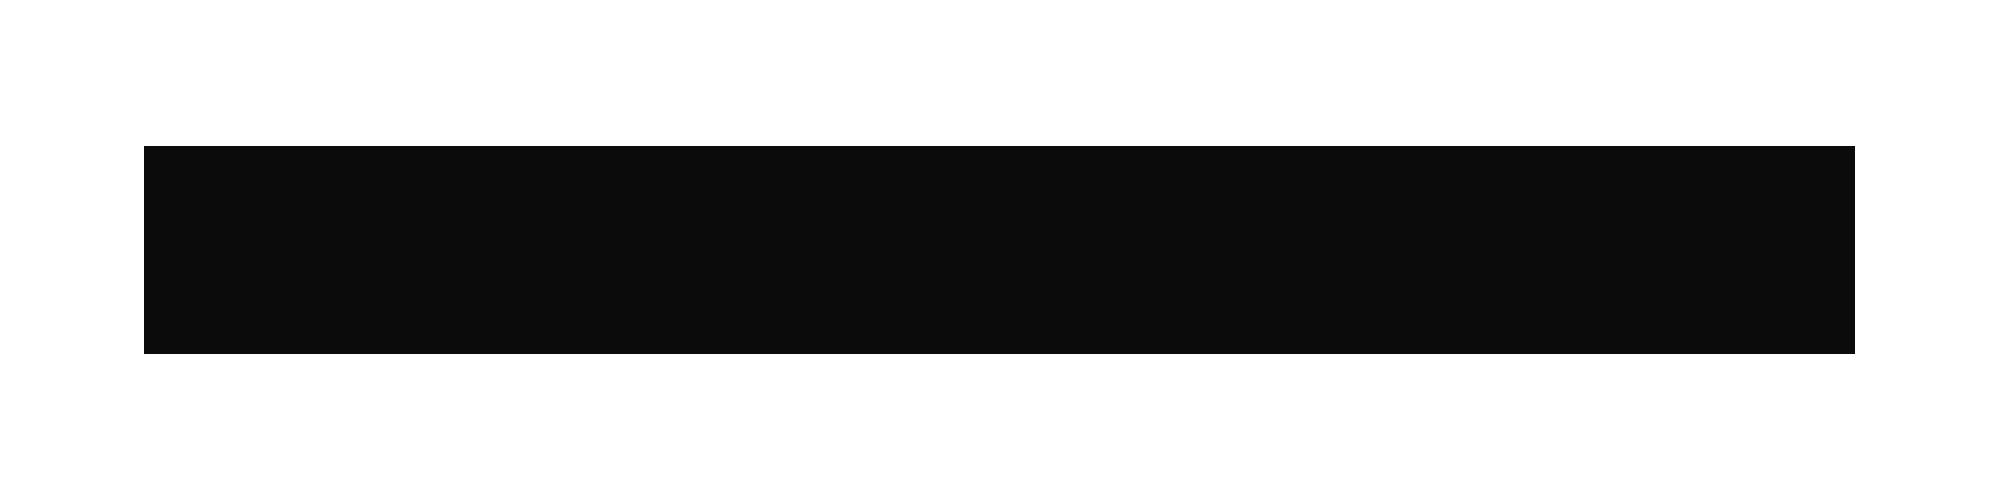 Varjo VR-2 Pro (HMD only)